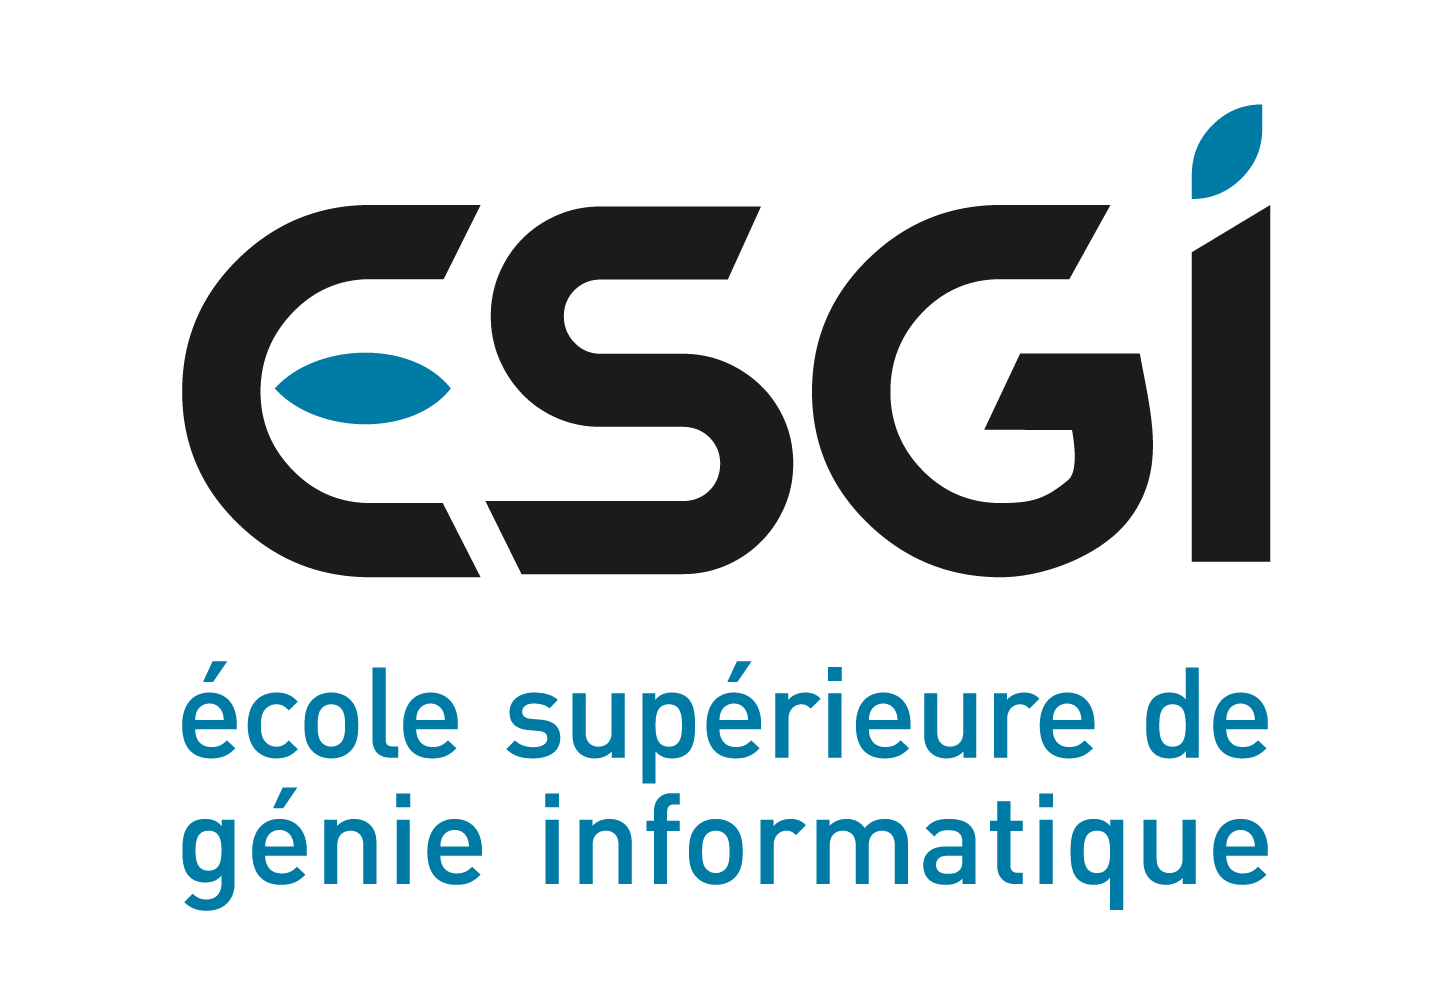 Ecole Supérieure de Génie Informatique (ESGI)